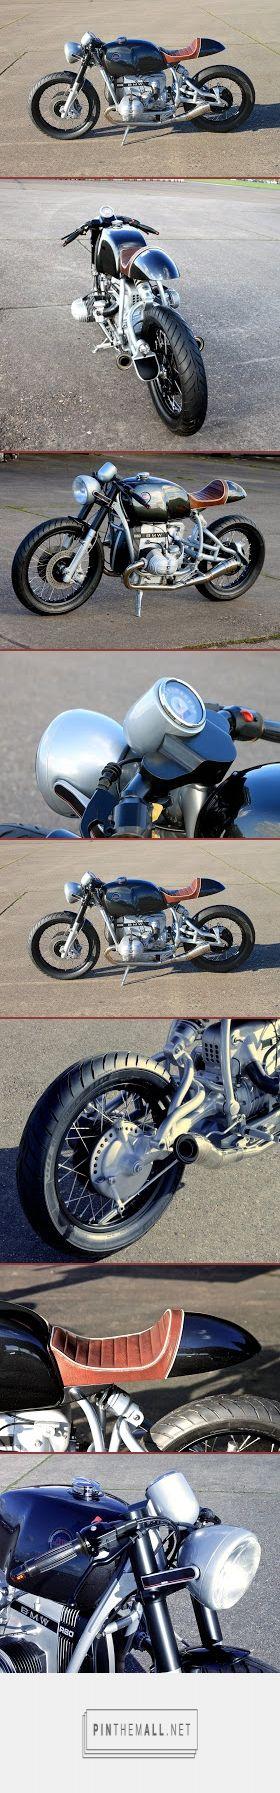 Ottonero Cafe Racer: BMW R80 - created via https://pinthemall.net